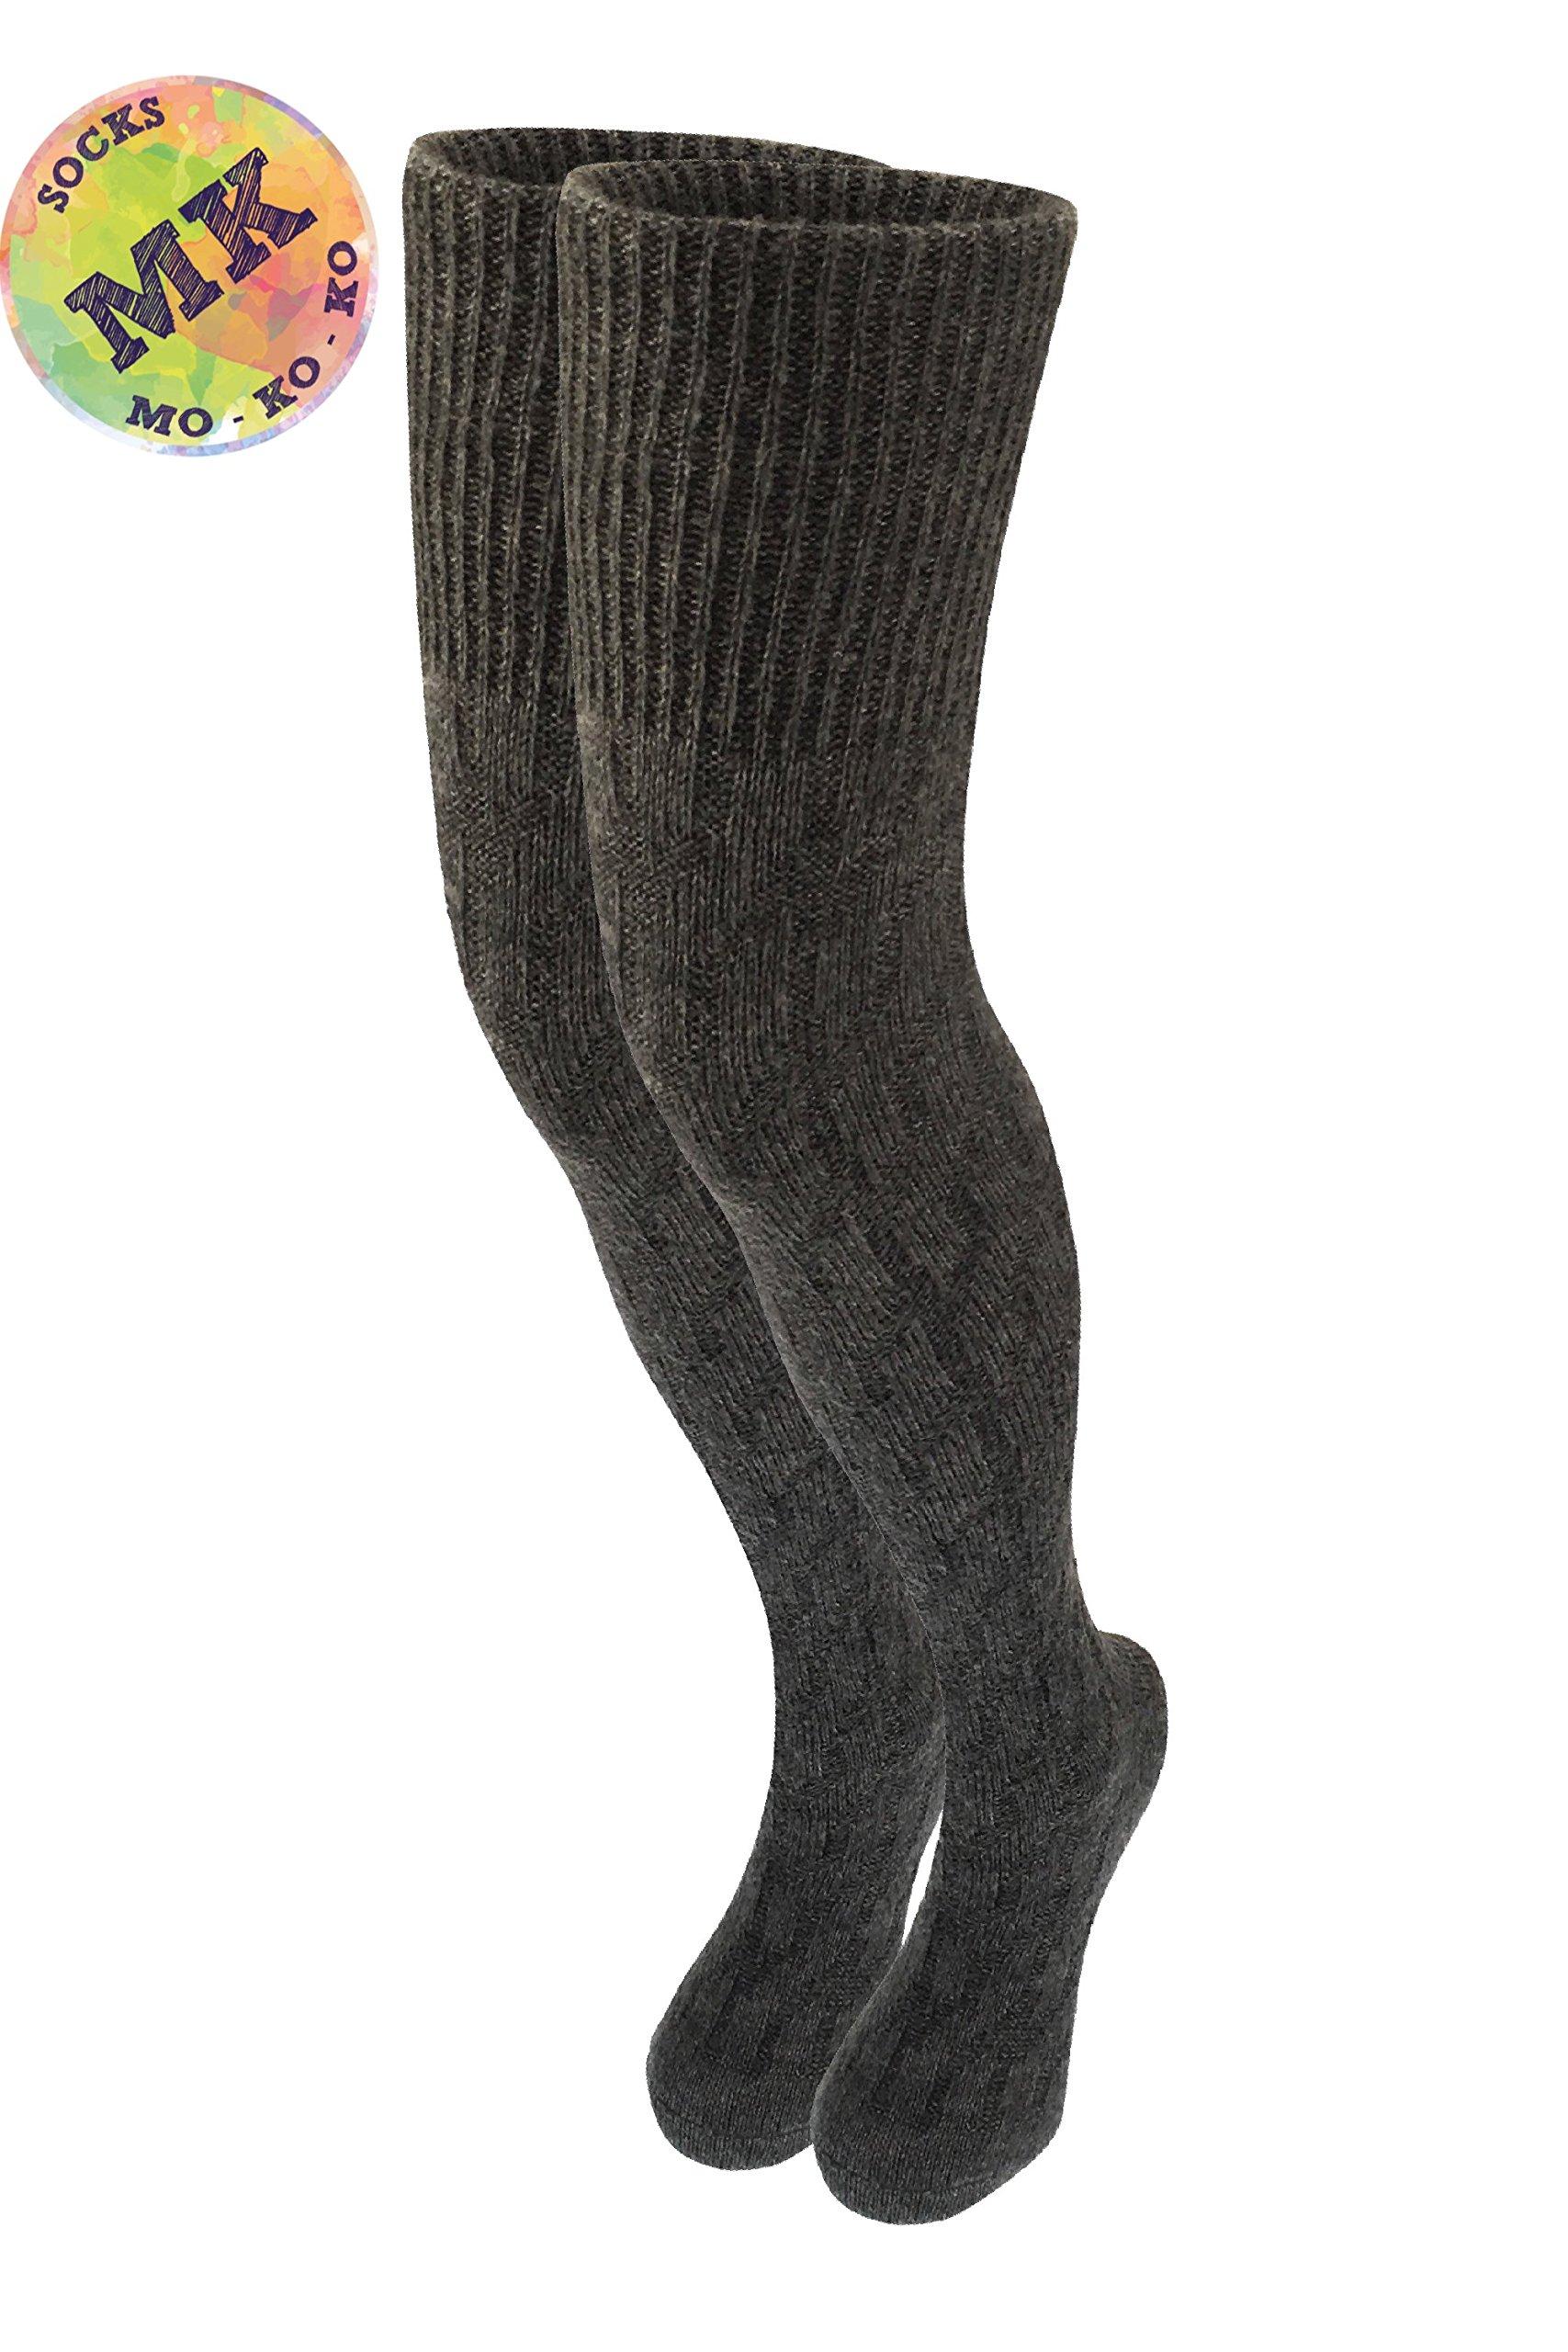 Knee High Socks - Merino Wool Womens Long Sexy Over Leg Warmer Crochet Thigh High Boot Socks, Extra Long Wool Socks Women - Size 6-10 (Grey)